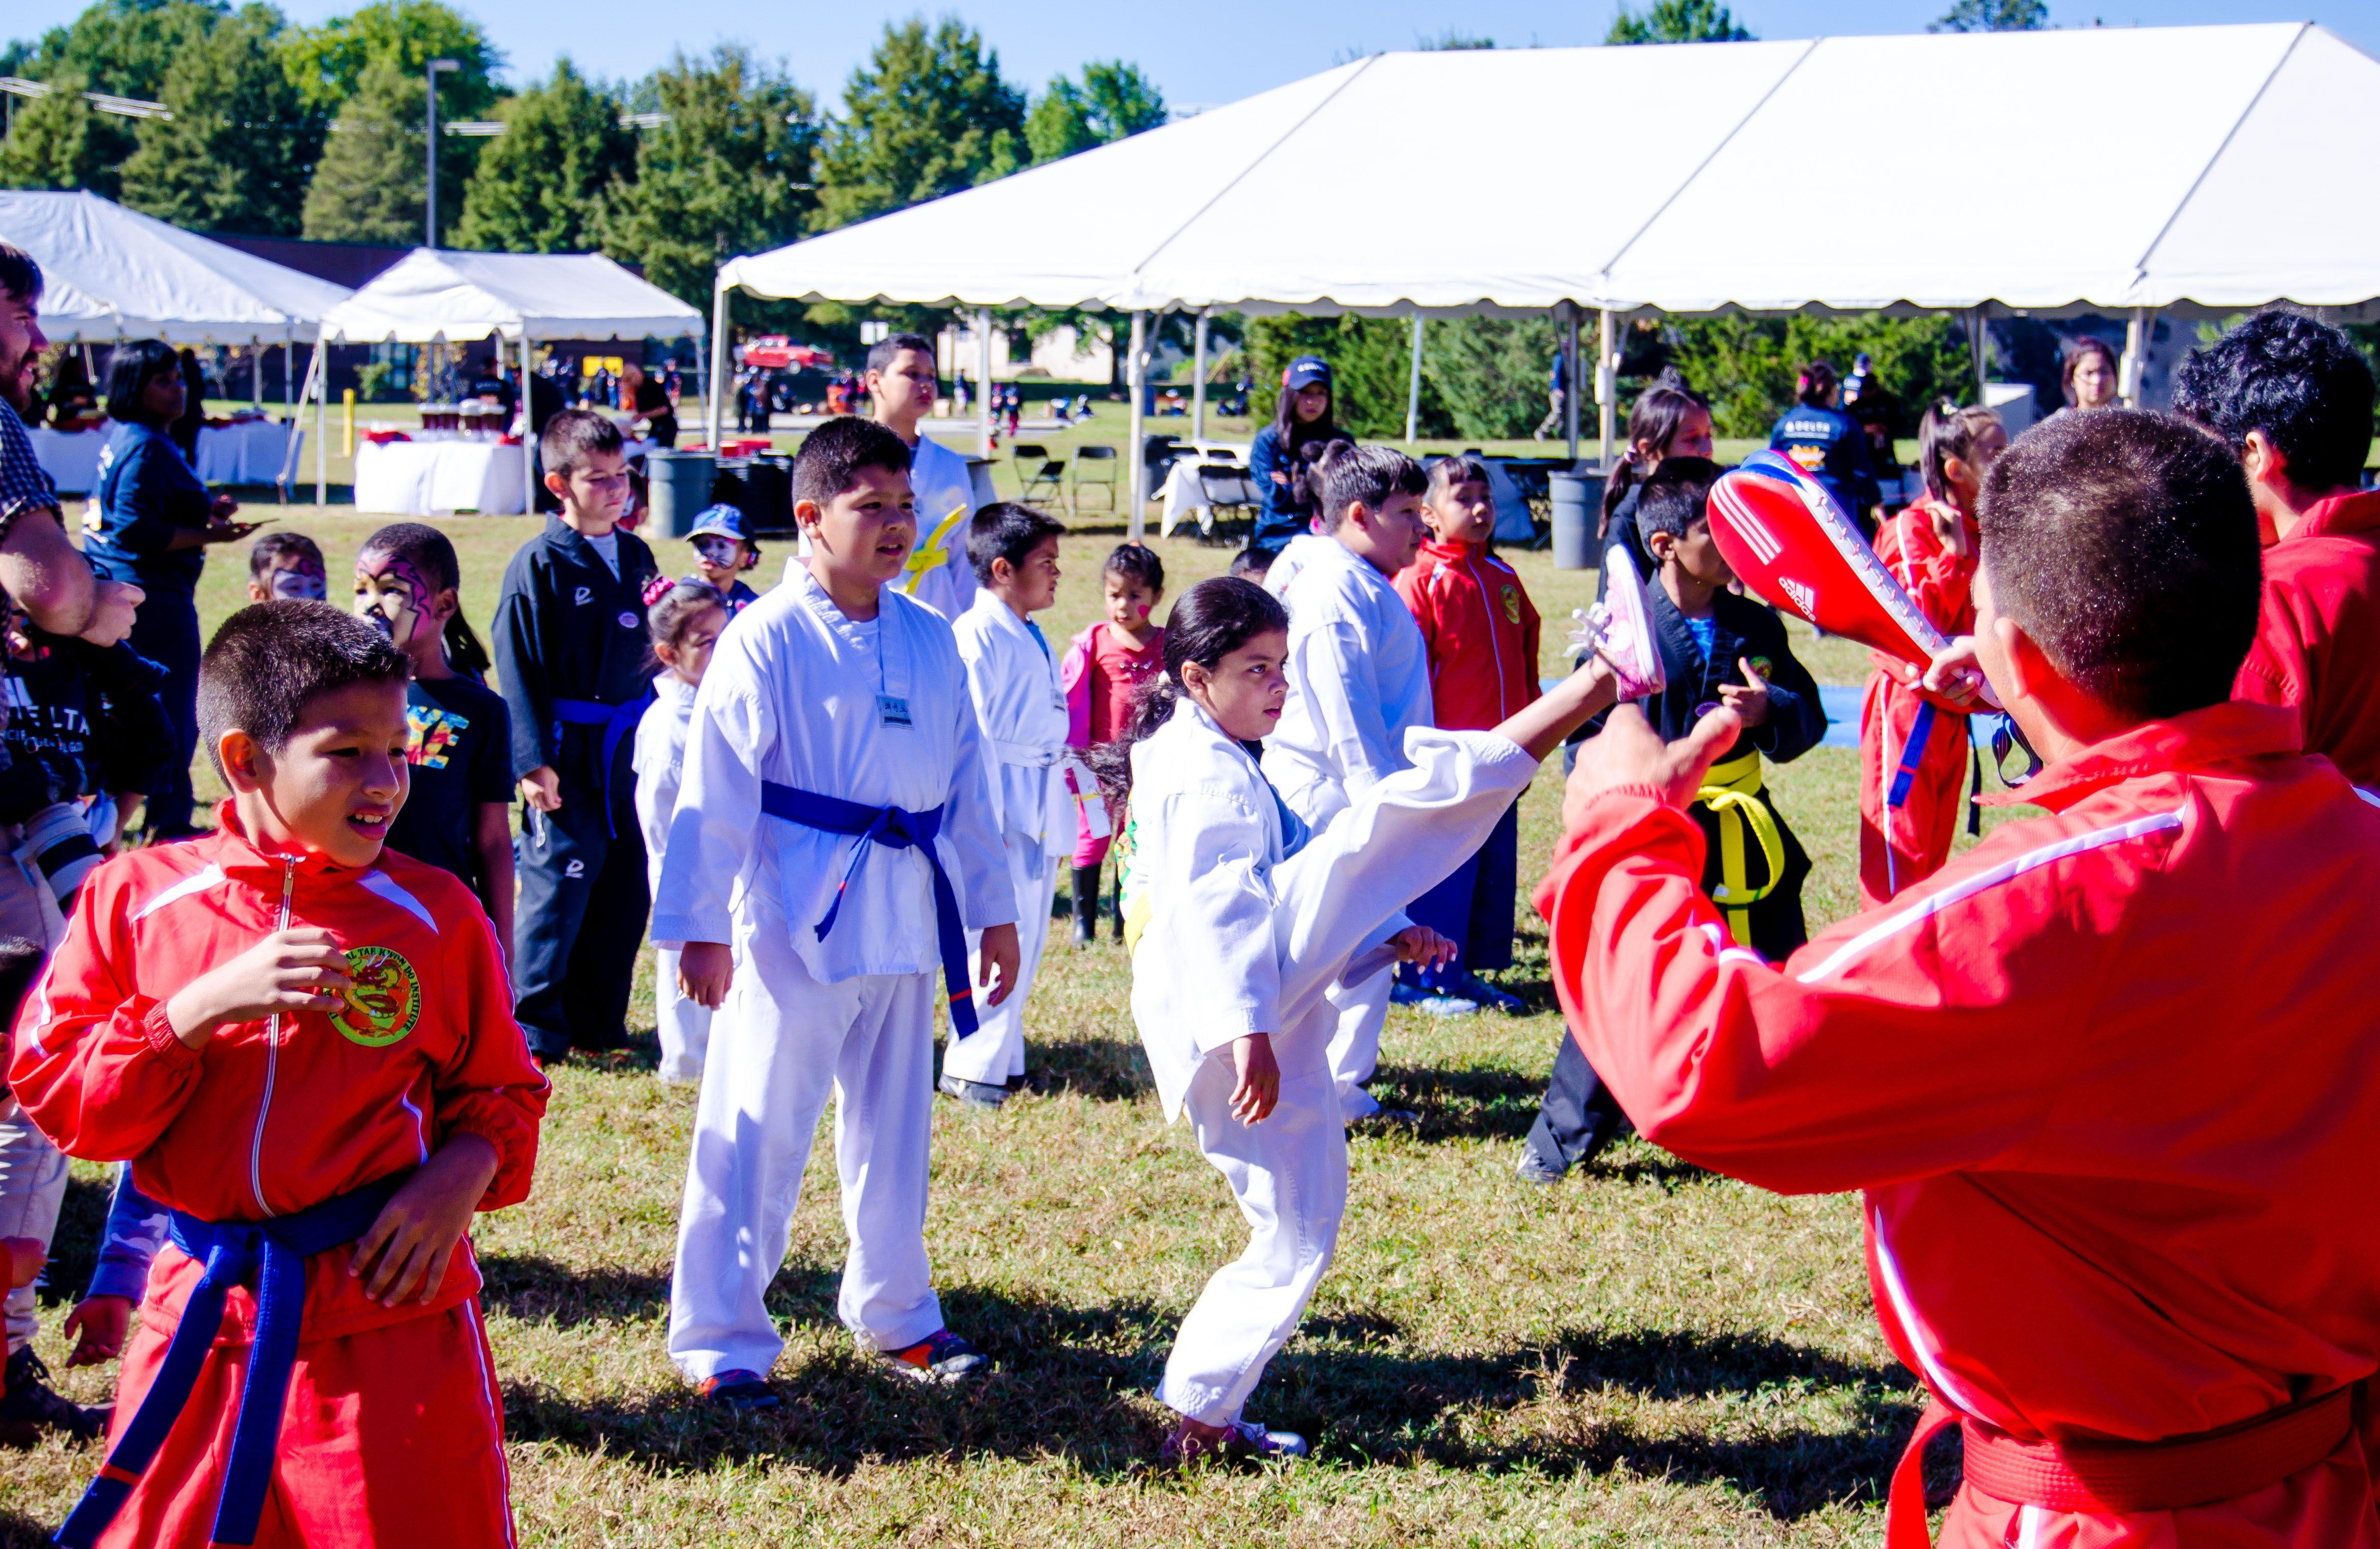 Kids karate class demonstration karate classes karate